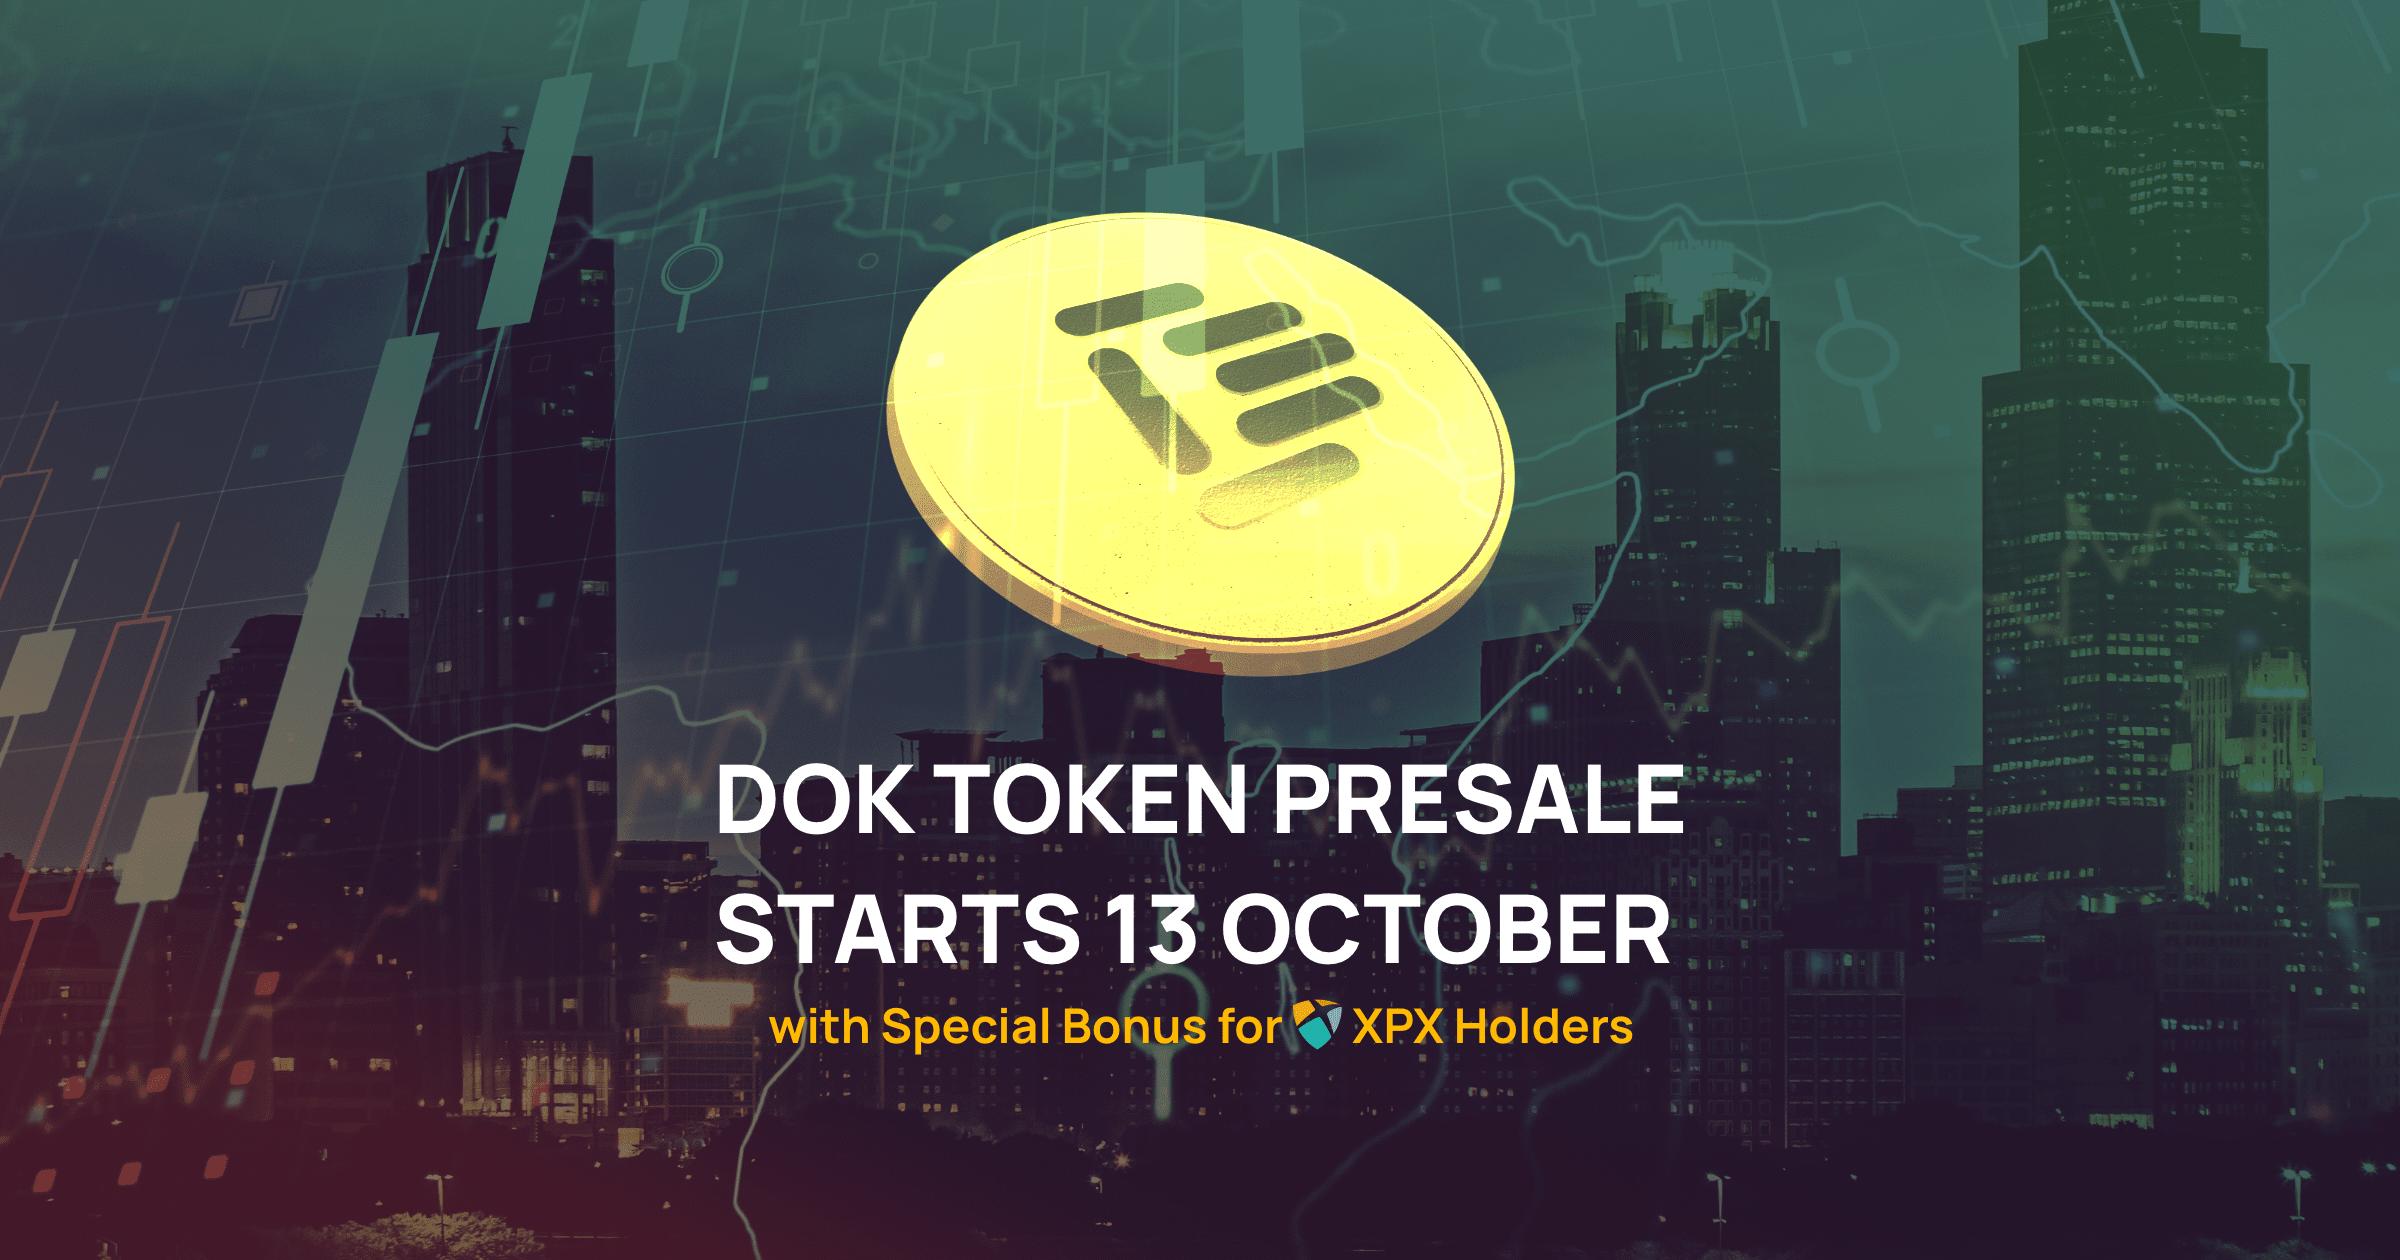 Special Bonus for XPX Holders in DOK Token Presale!